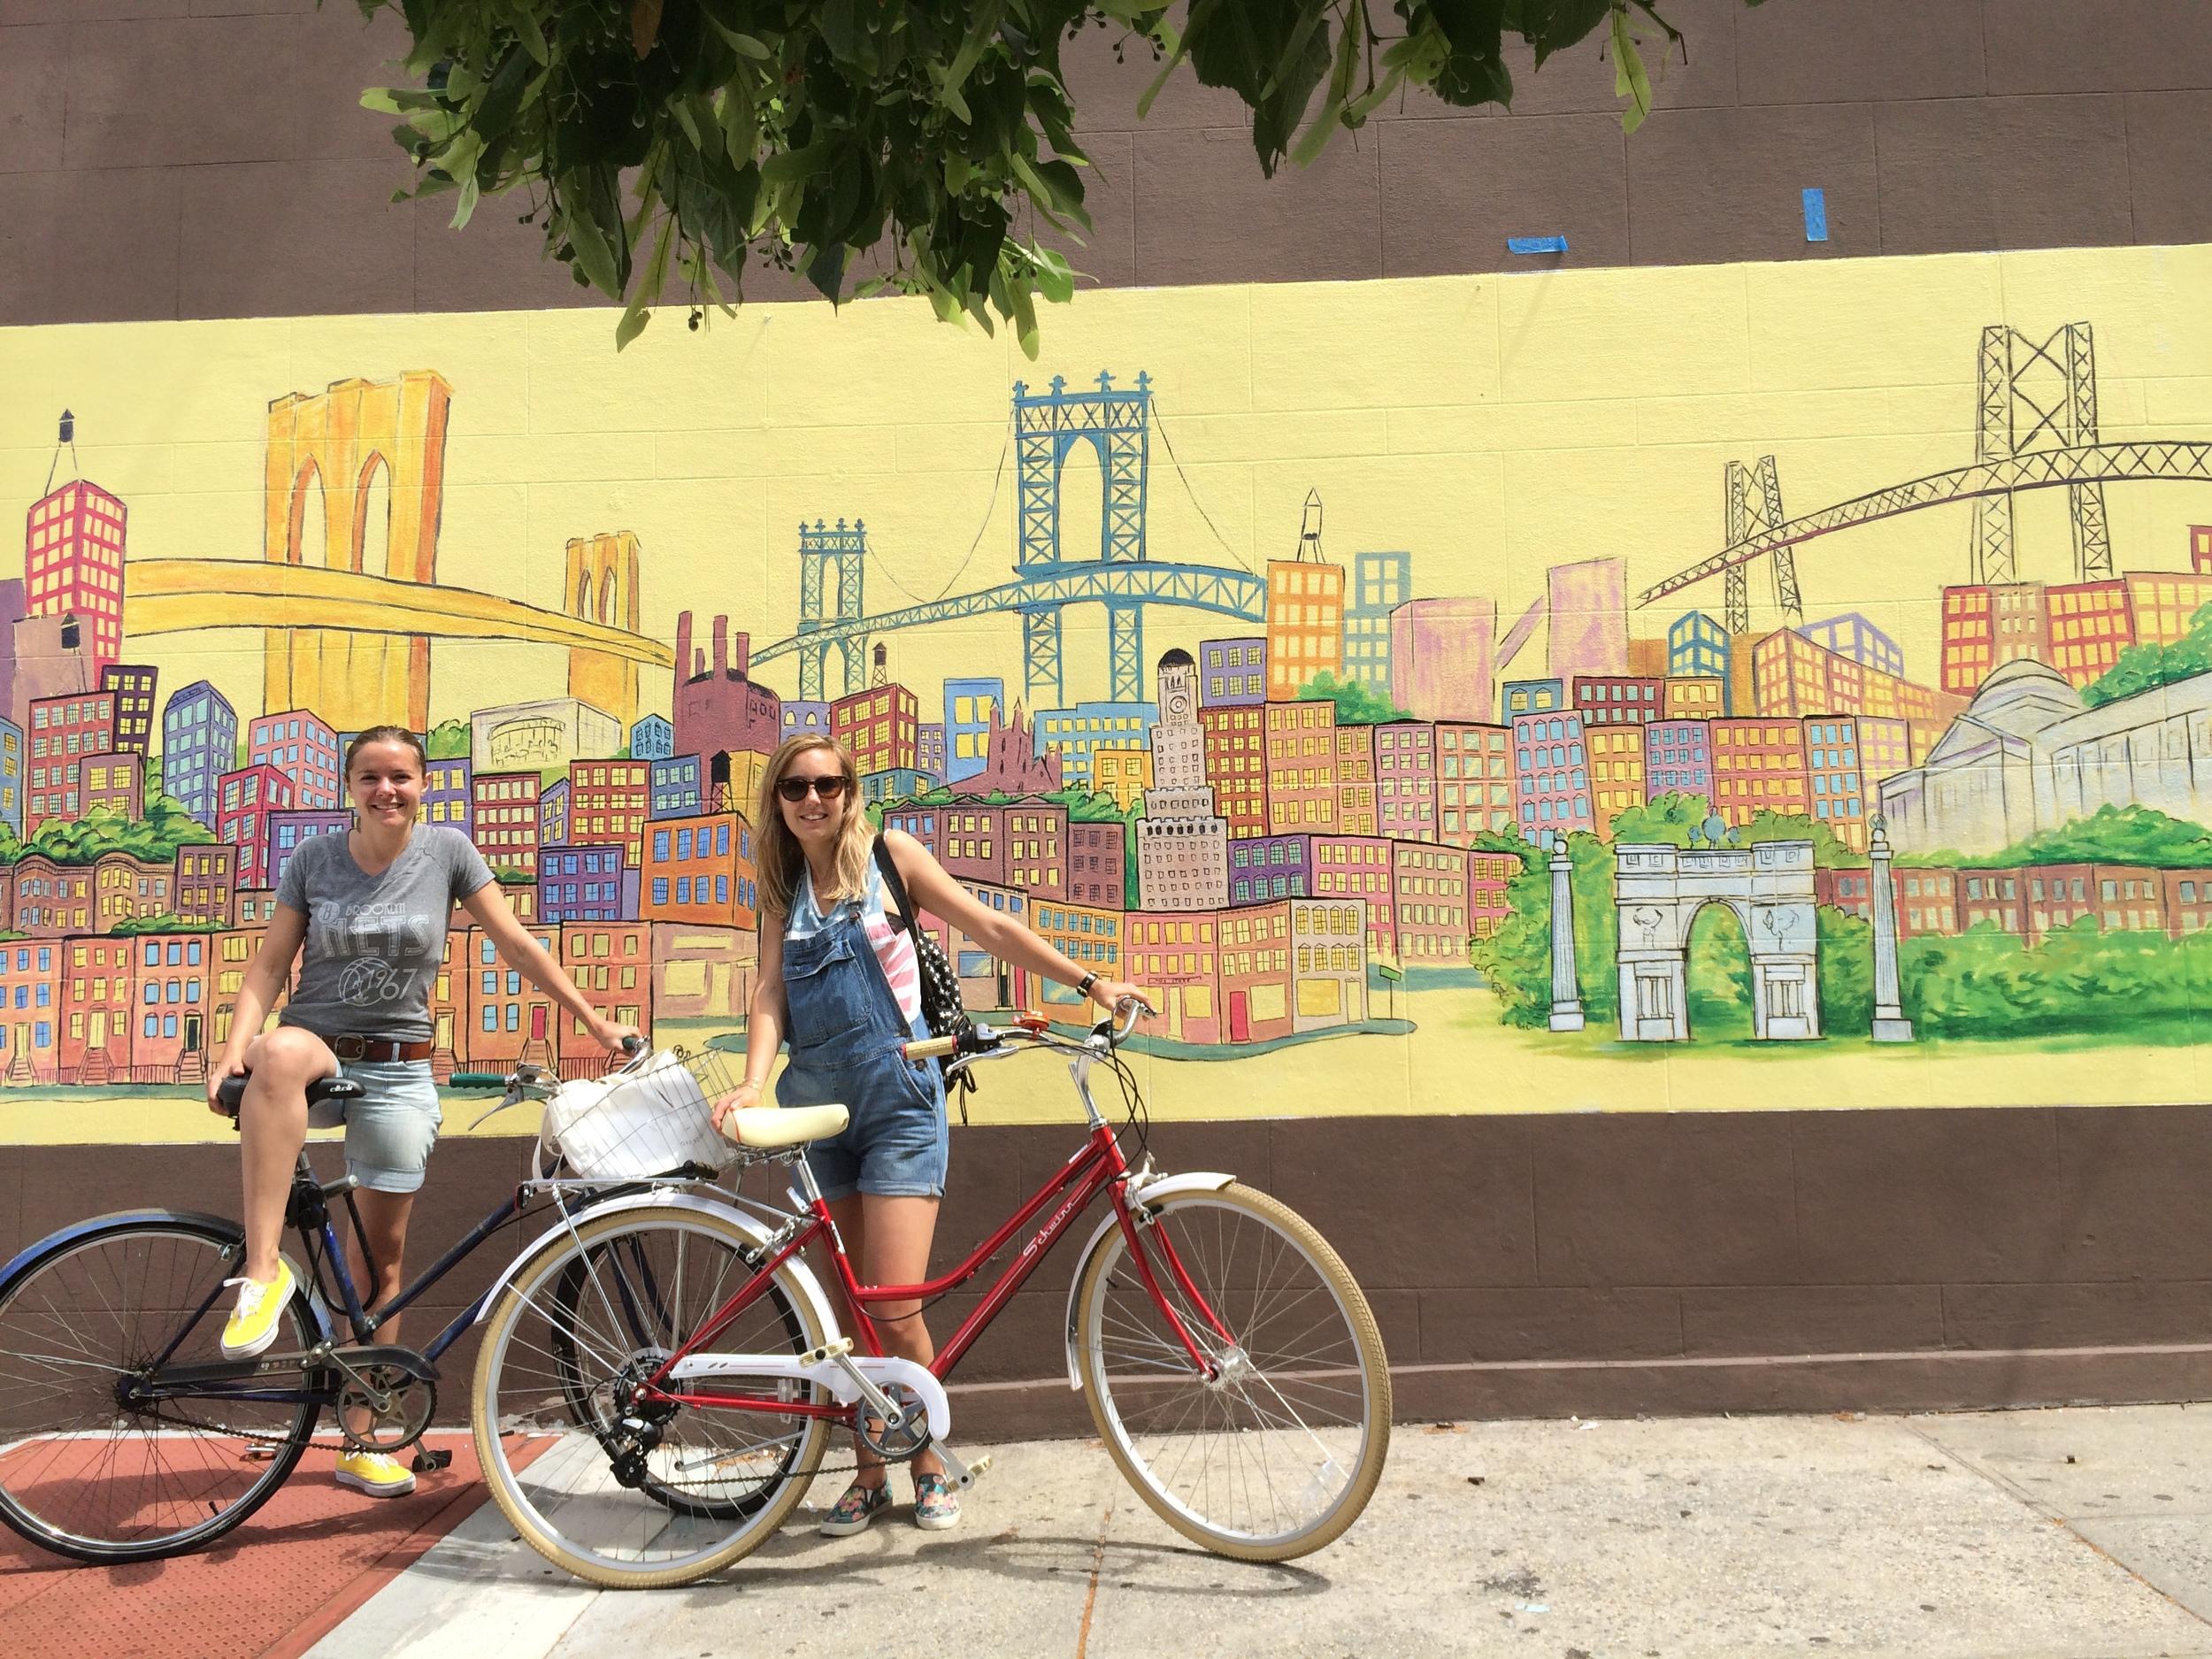 Tour à vélo de Brooklyn avec Elise ( www.newyorkoffroad.com ) et Florence ( http://www.flosglitterworld.com/ )